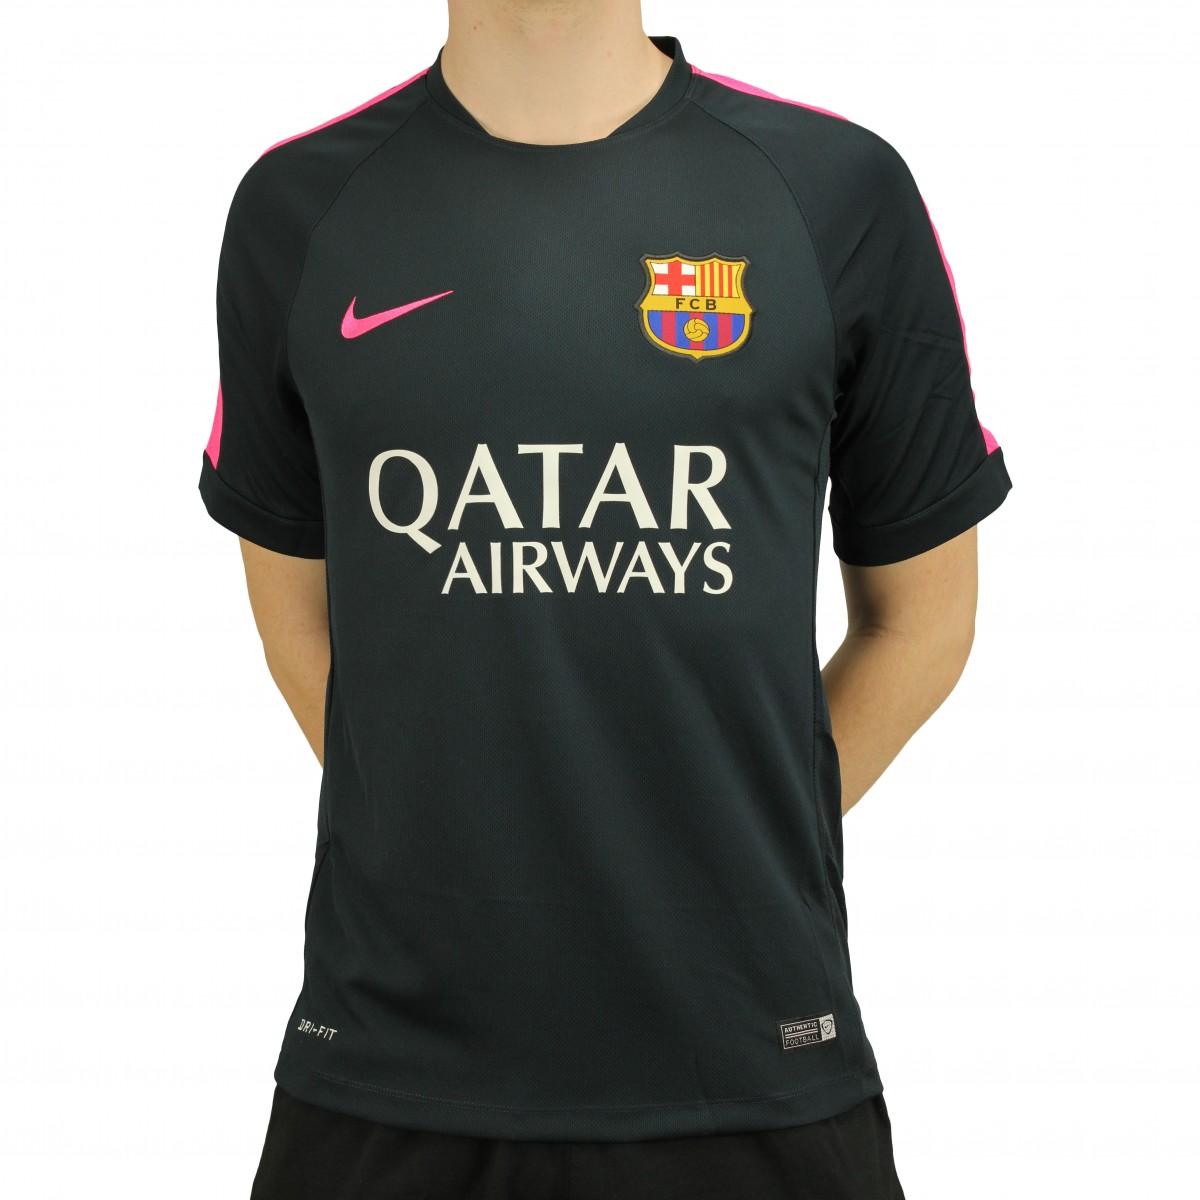 4e5603bb56 Camisa Nike Barcelona Treino 2014